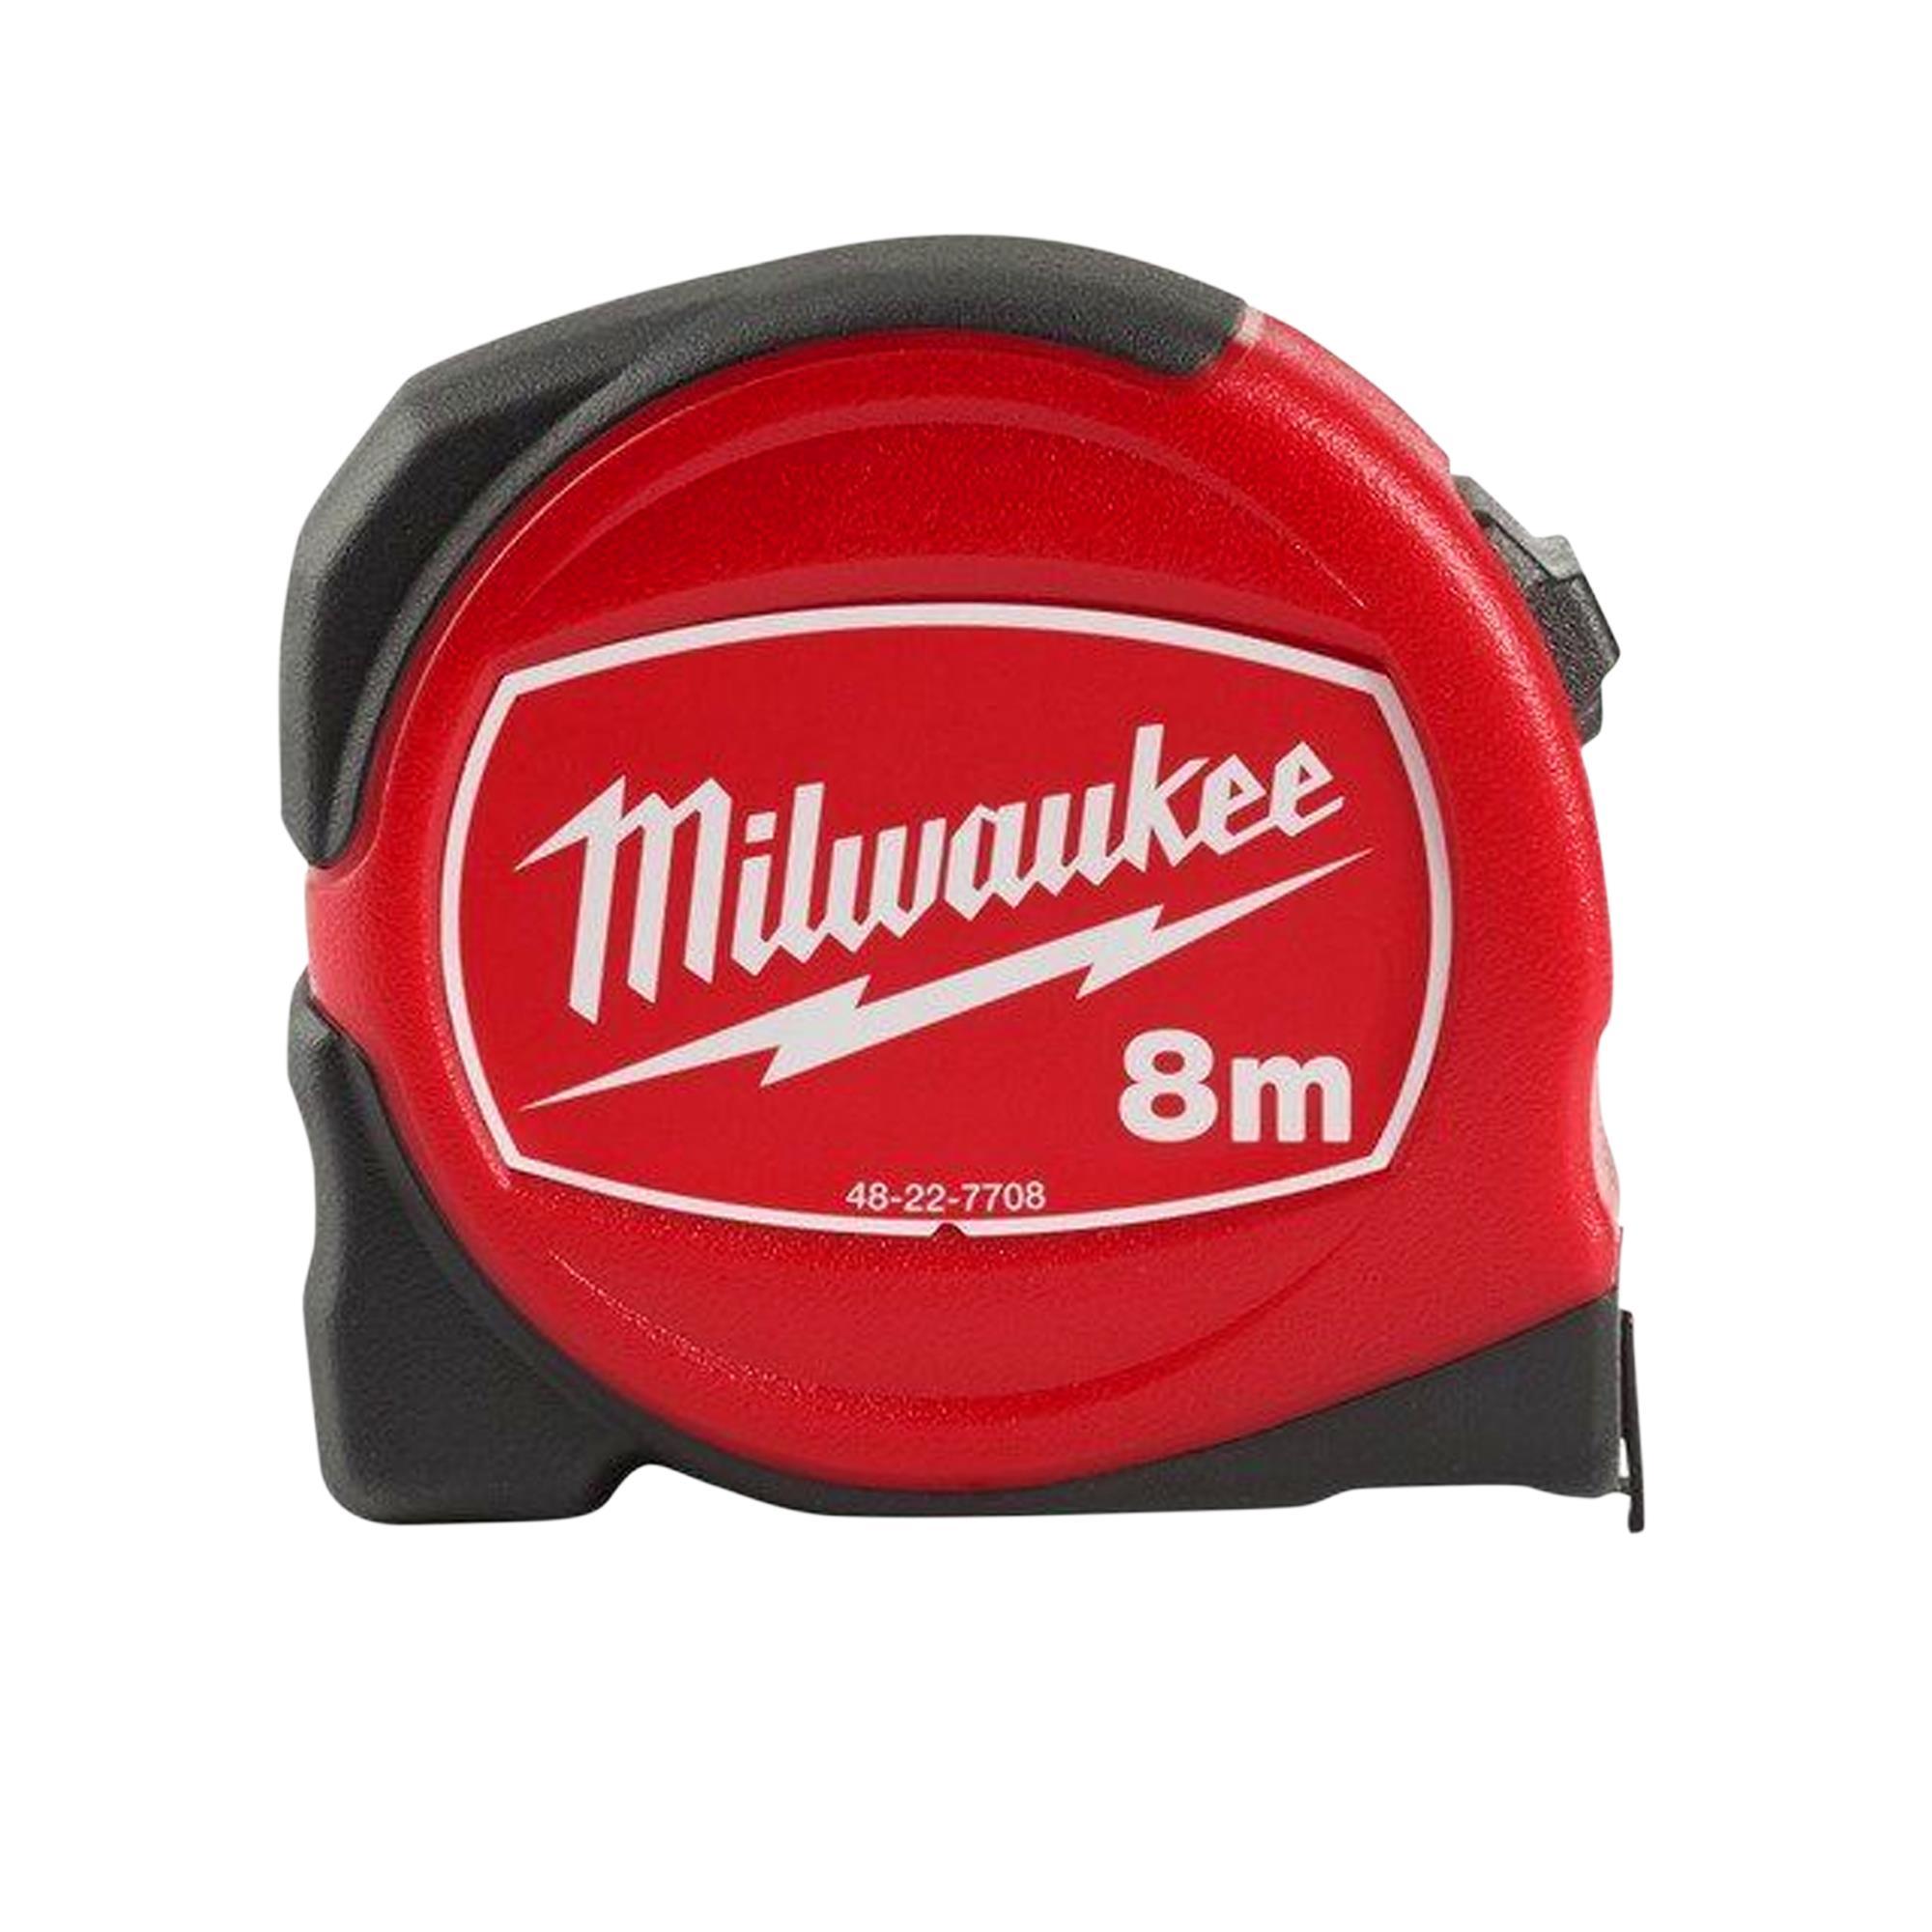 Milwaukee T48227708 Ağır Hizmet Tipi Kompakt Şerit Metre 8m